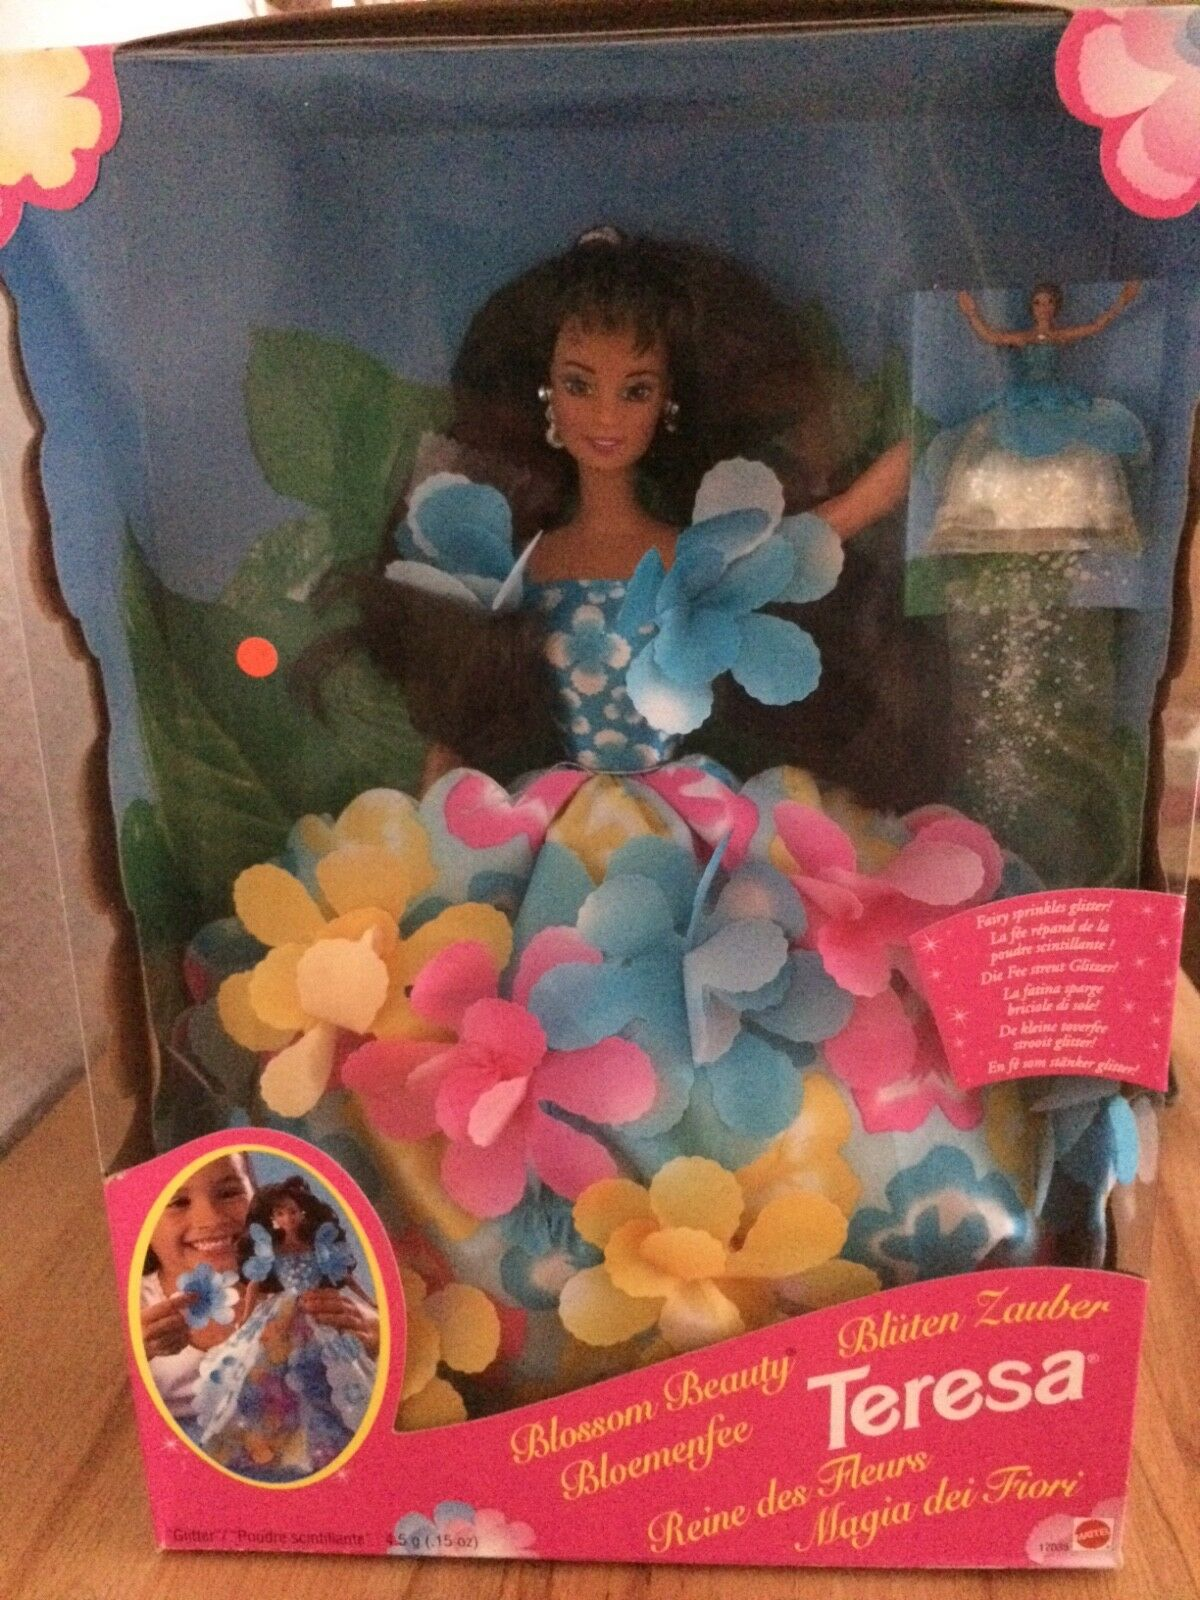 Barbie flores mágica Teressa mattel 17035